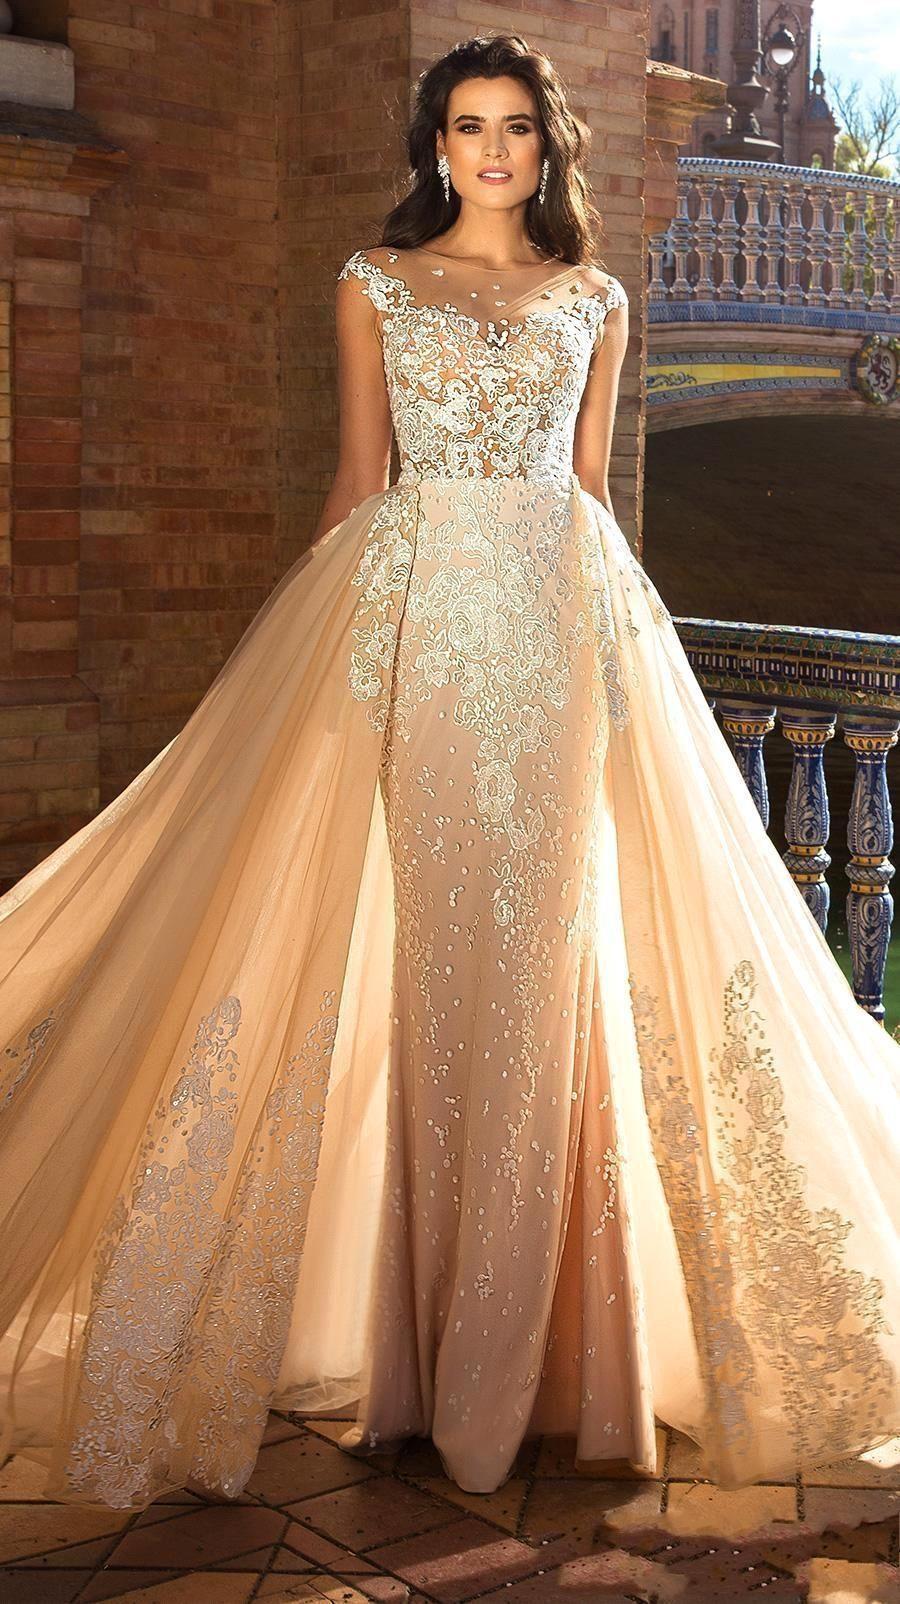 Lace Wedding Dresses Ireland Goldin Ma